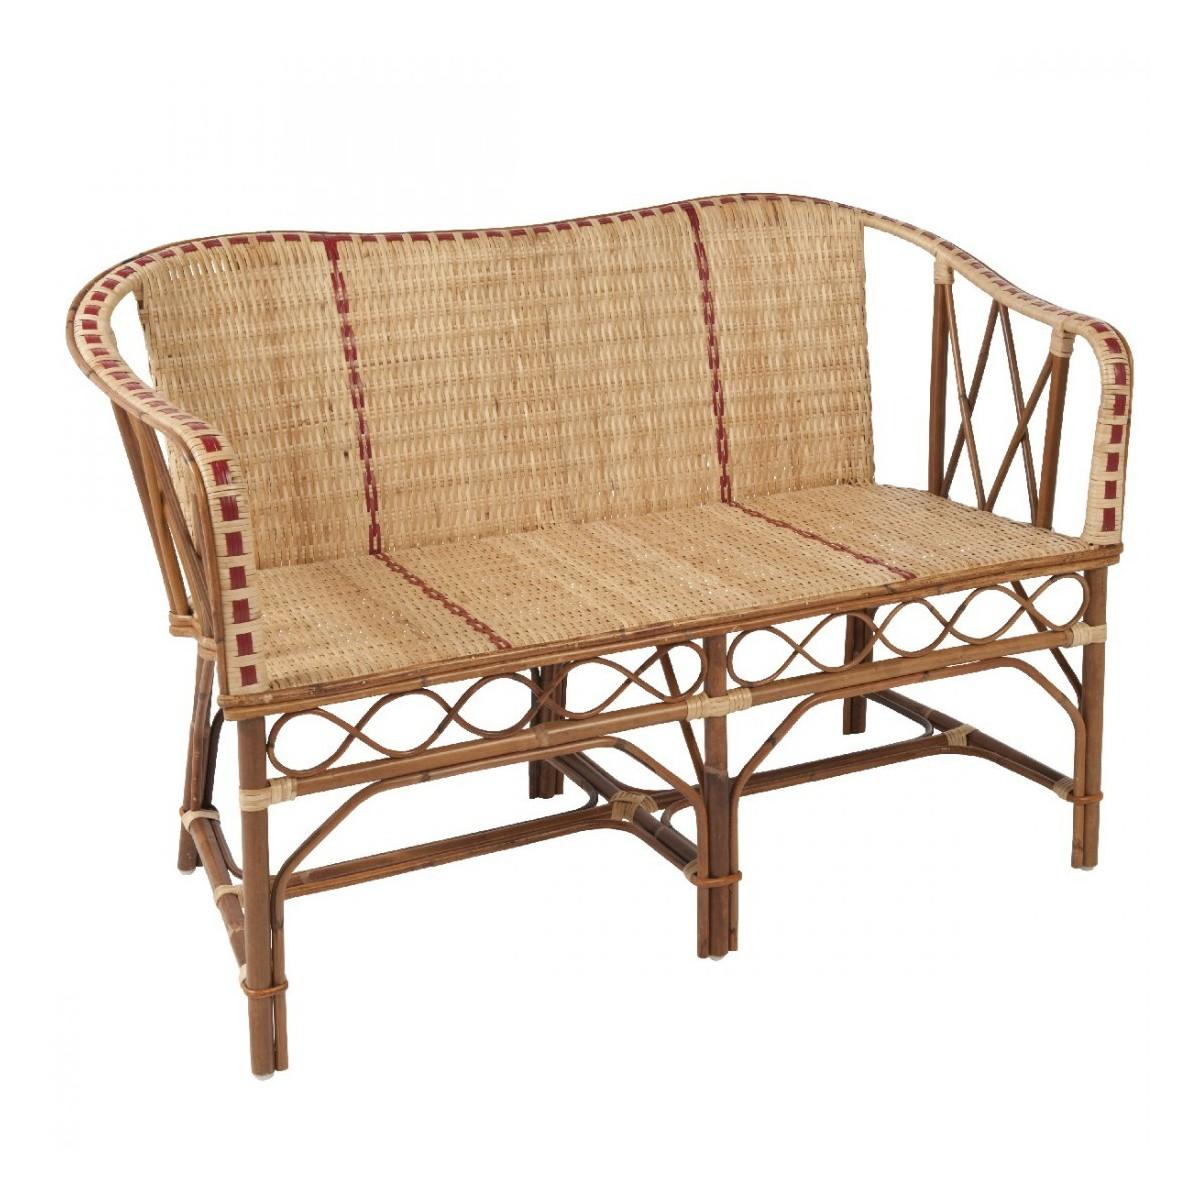 salon bagatelle en rotin naturel sp cial ext rieur naturel. Black Bedroom Furniture Sets. Home Design Ideas